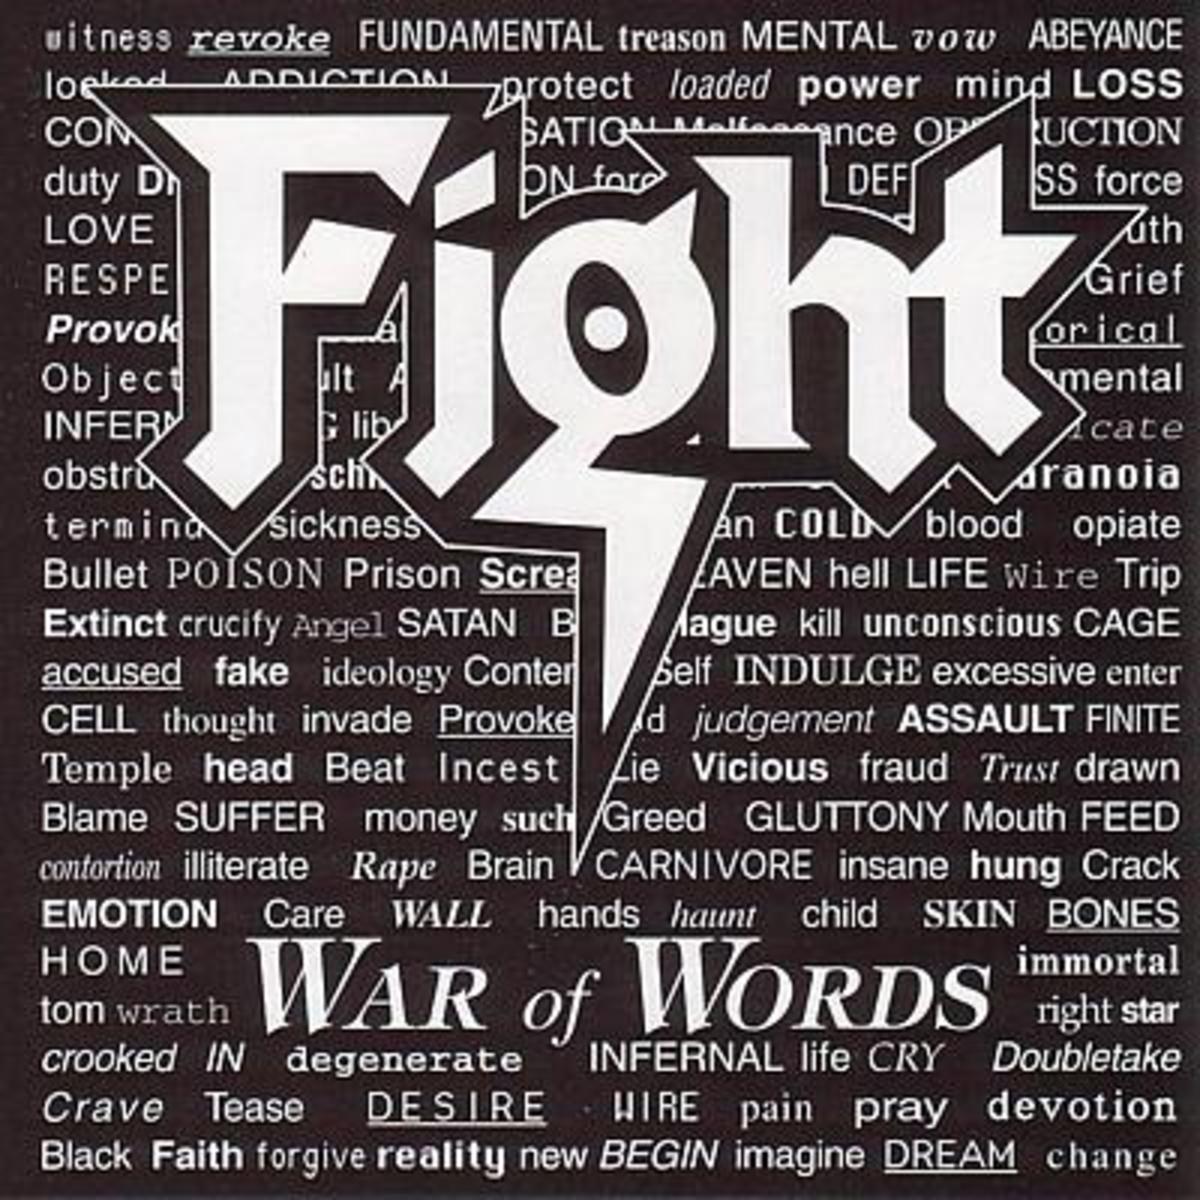 forgotten-hard-rock-albums-fight-war-of-words-1993